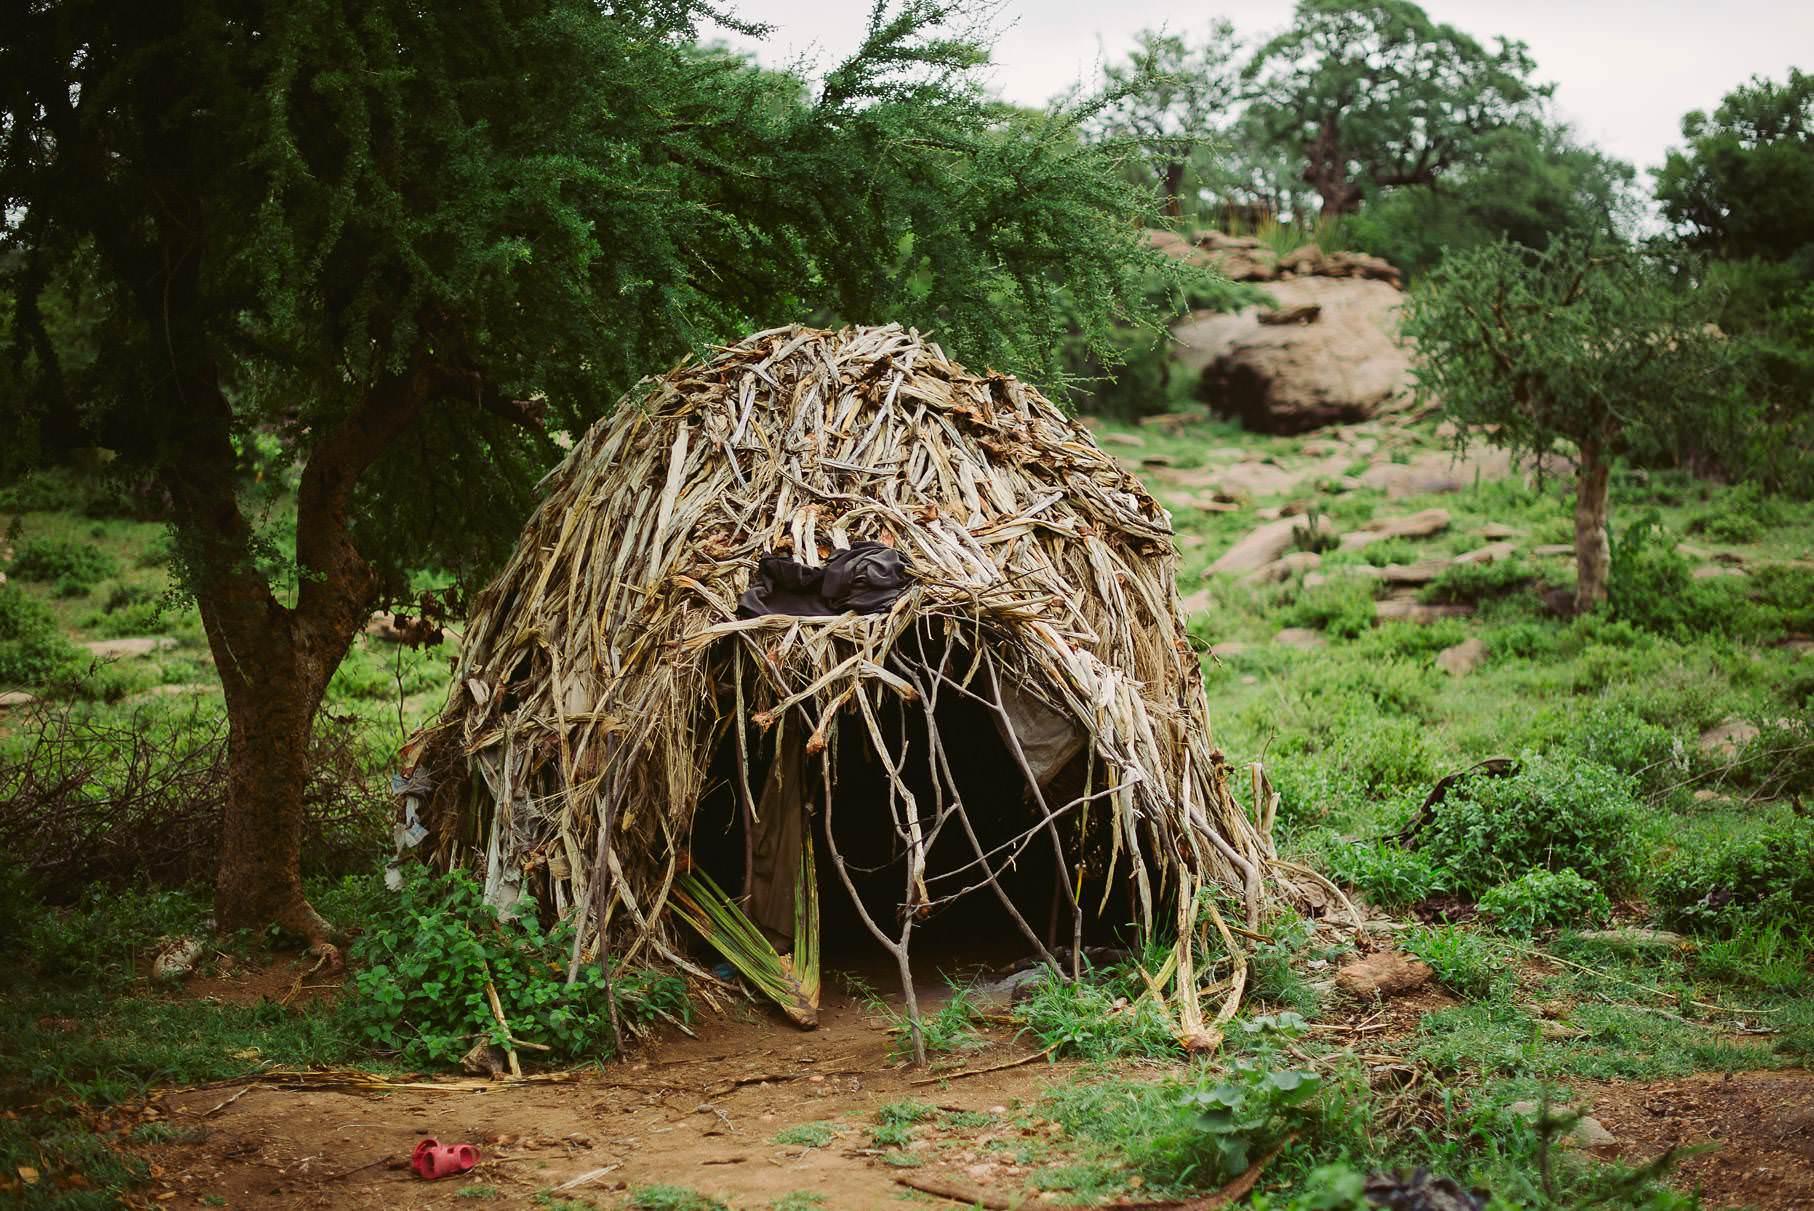 0066 tansania nd6 8044 anne bjoern fotografie hochzeitsfotograf hamburg - This is Tanzania - Serengeti, Kilimanjaro & Sansibar